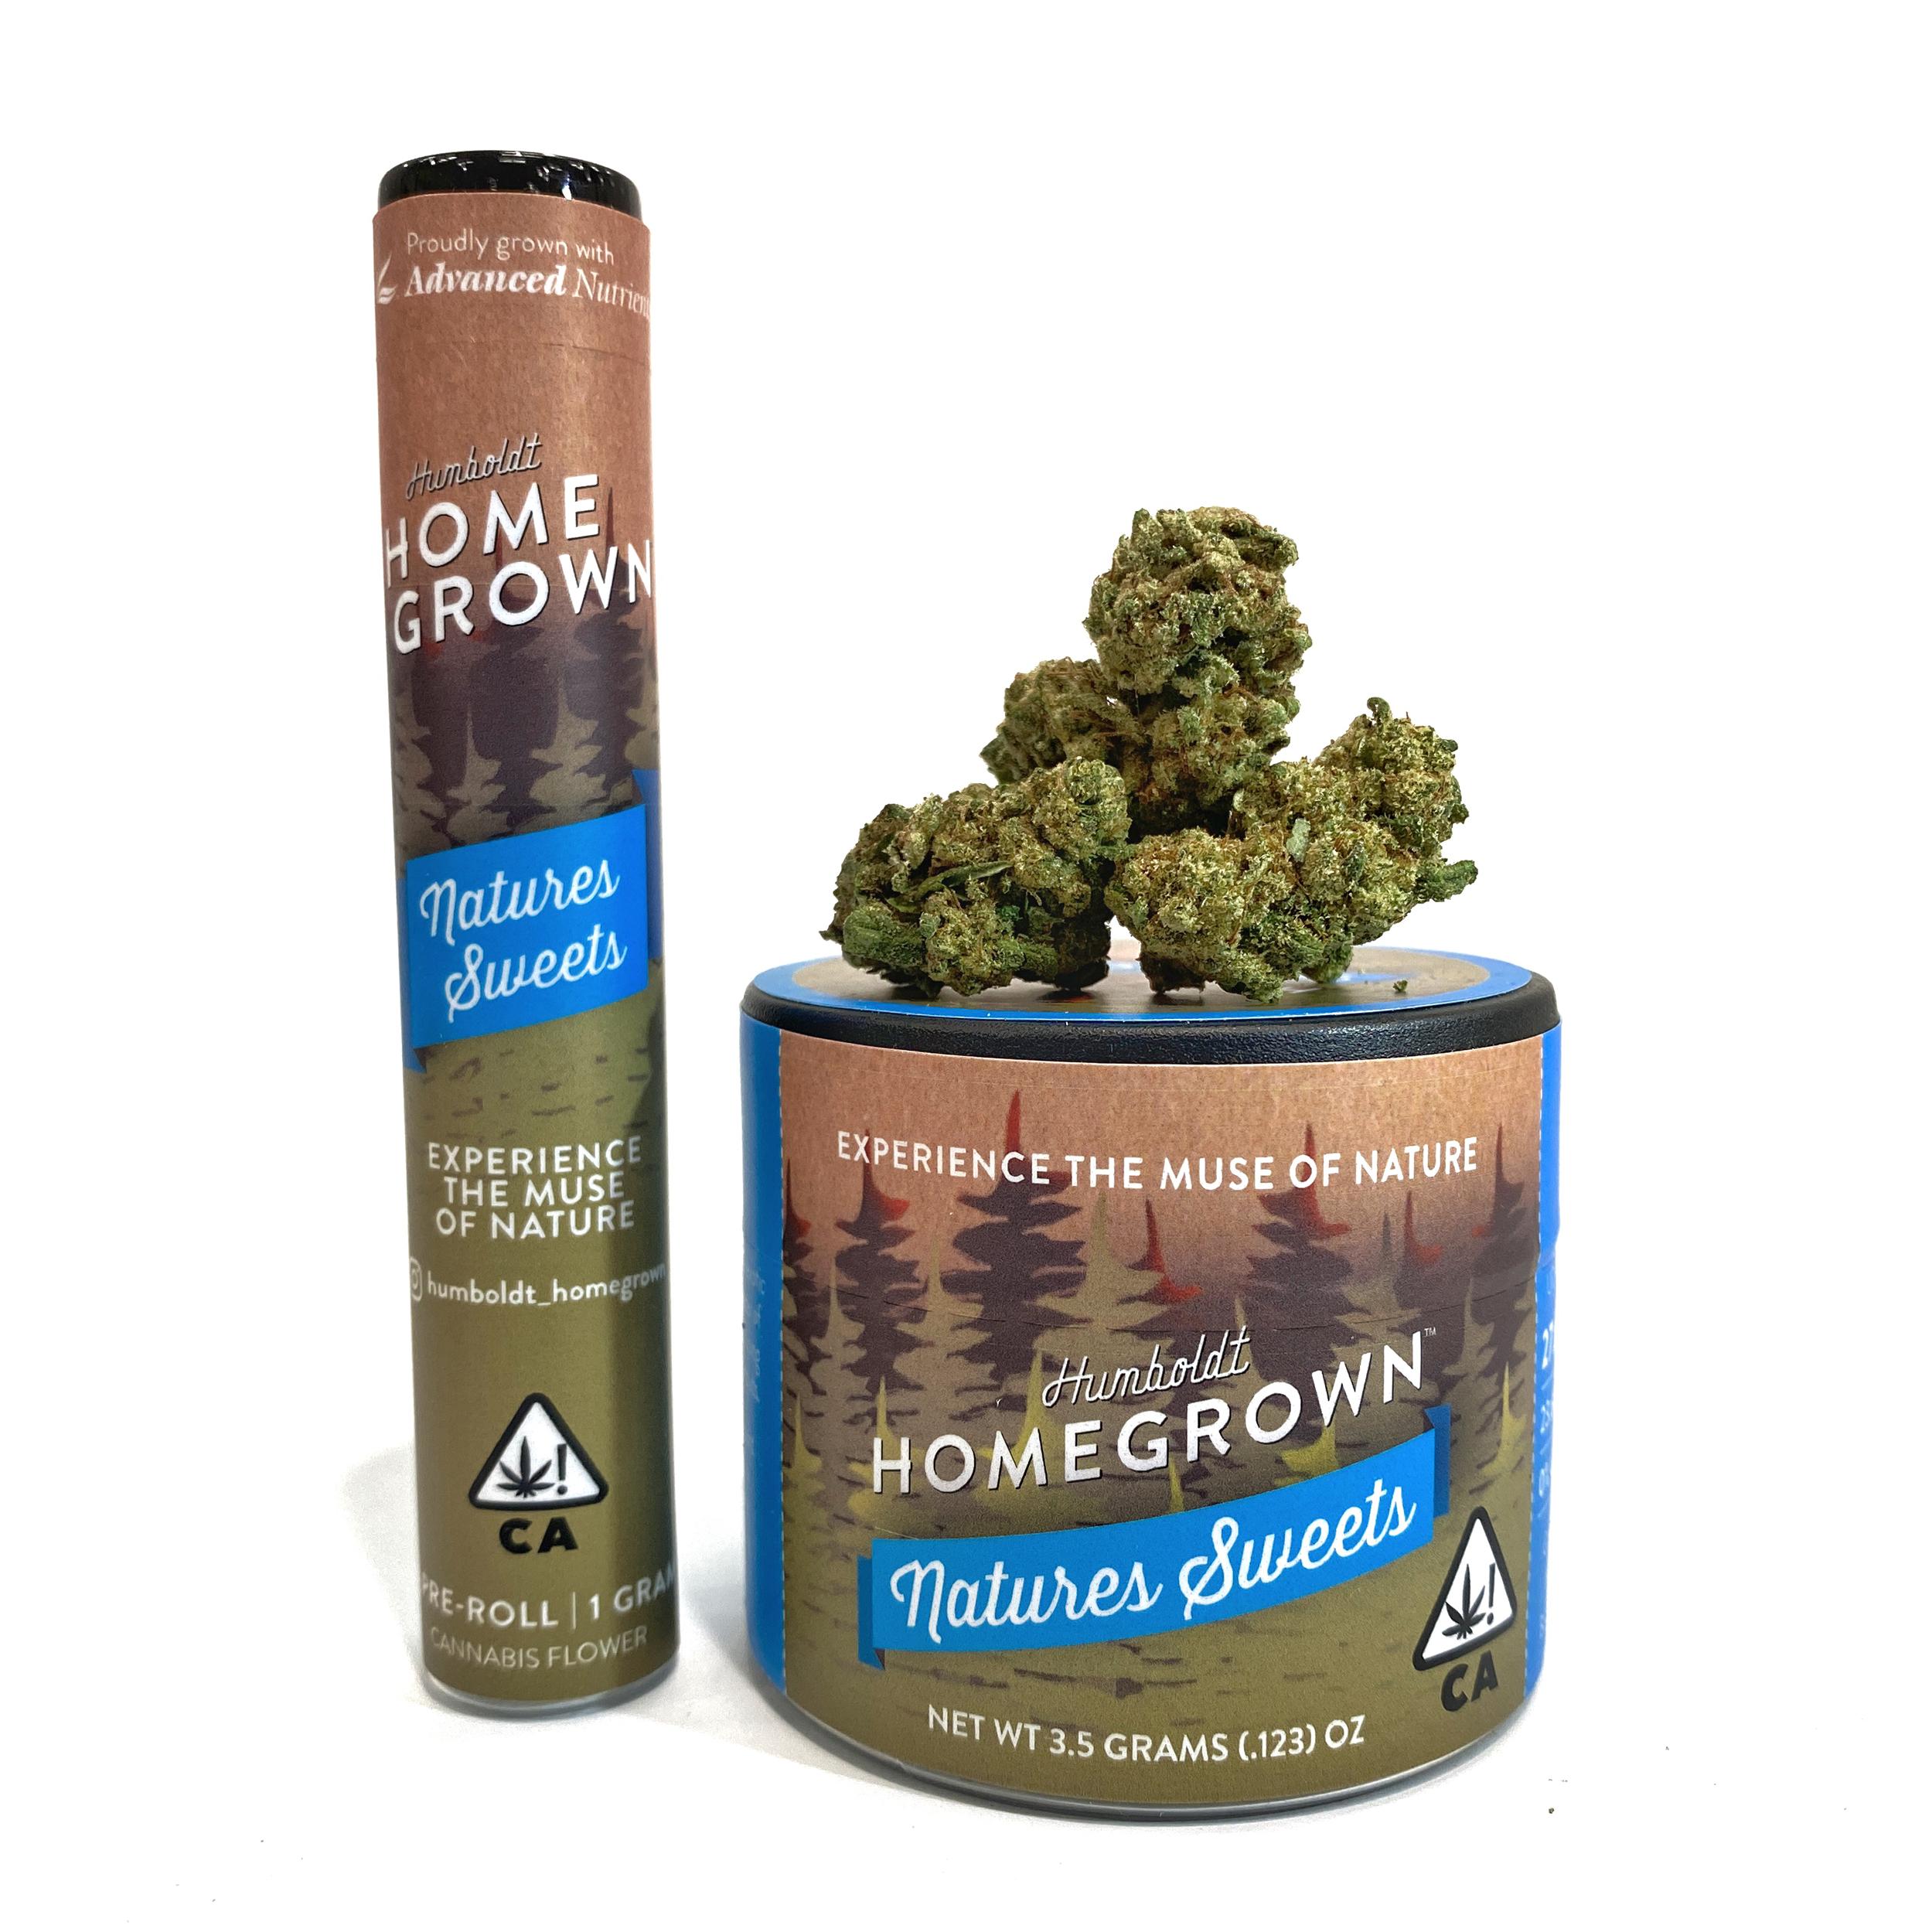 Humboldt Homegrown Aroma Earth Flavor